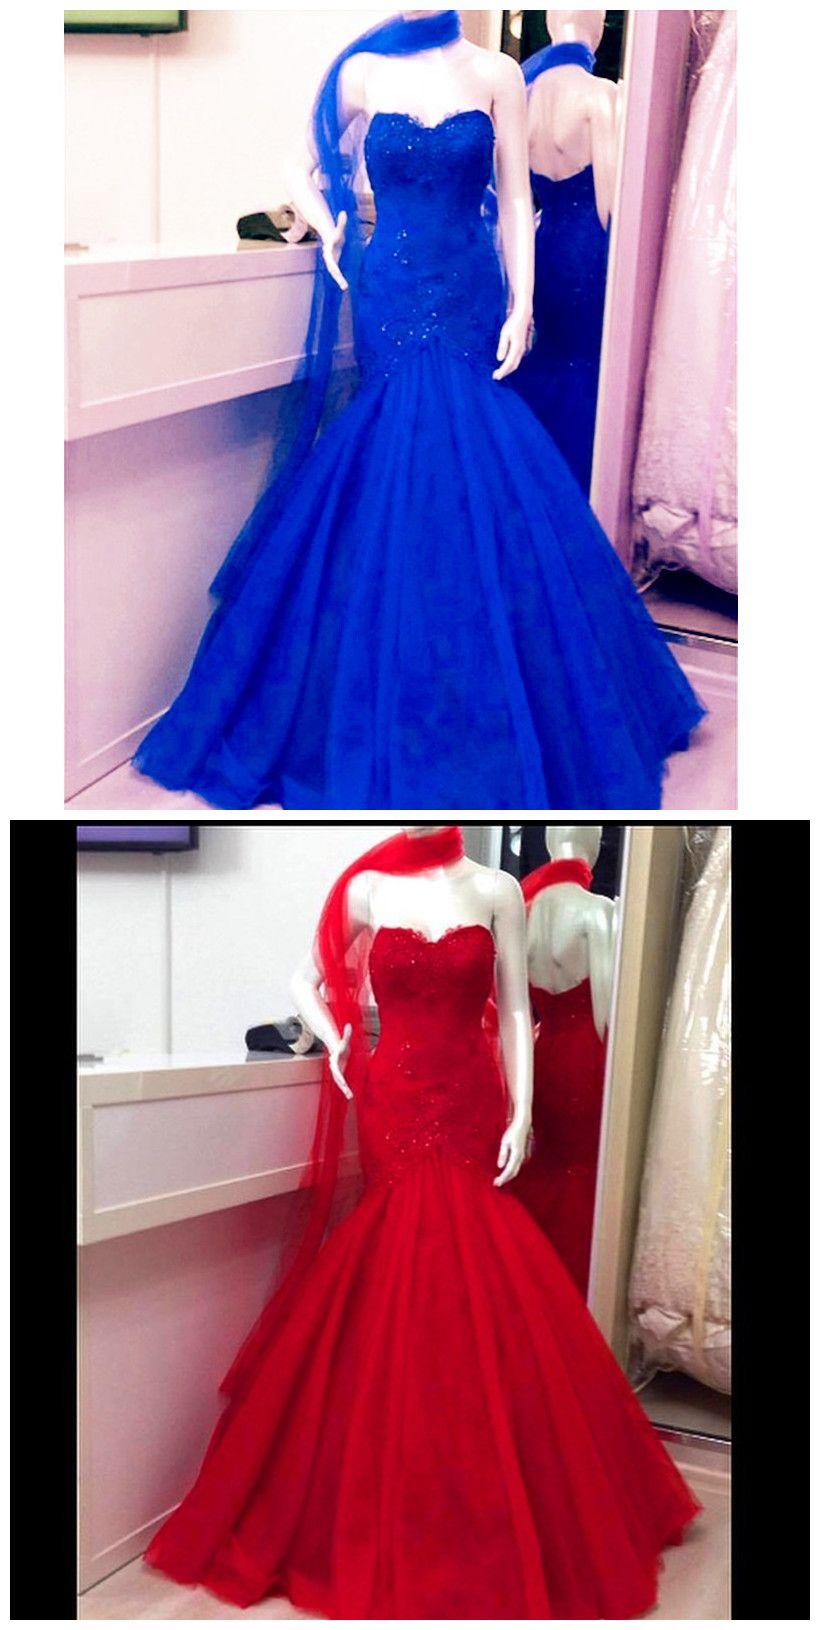 New arrival prom dressmodest prom dressred prom dressroyal